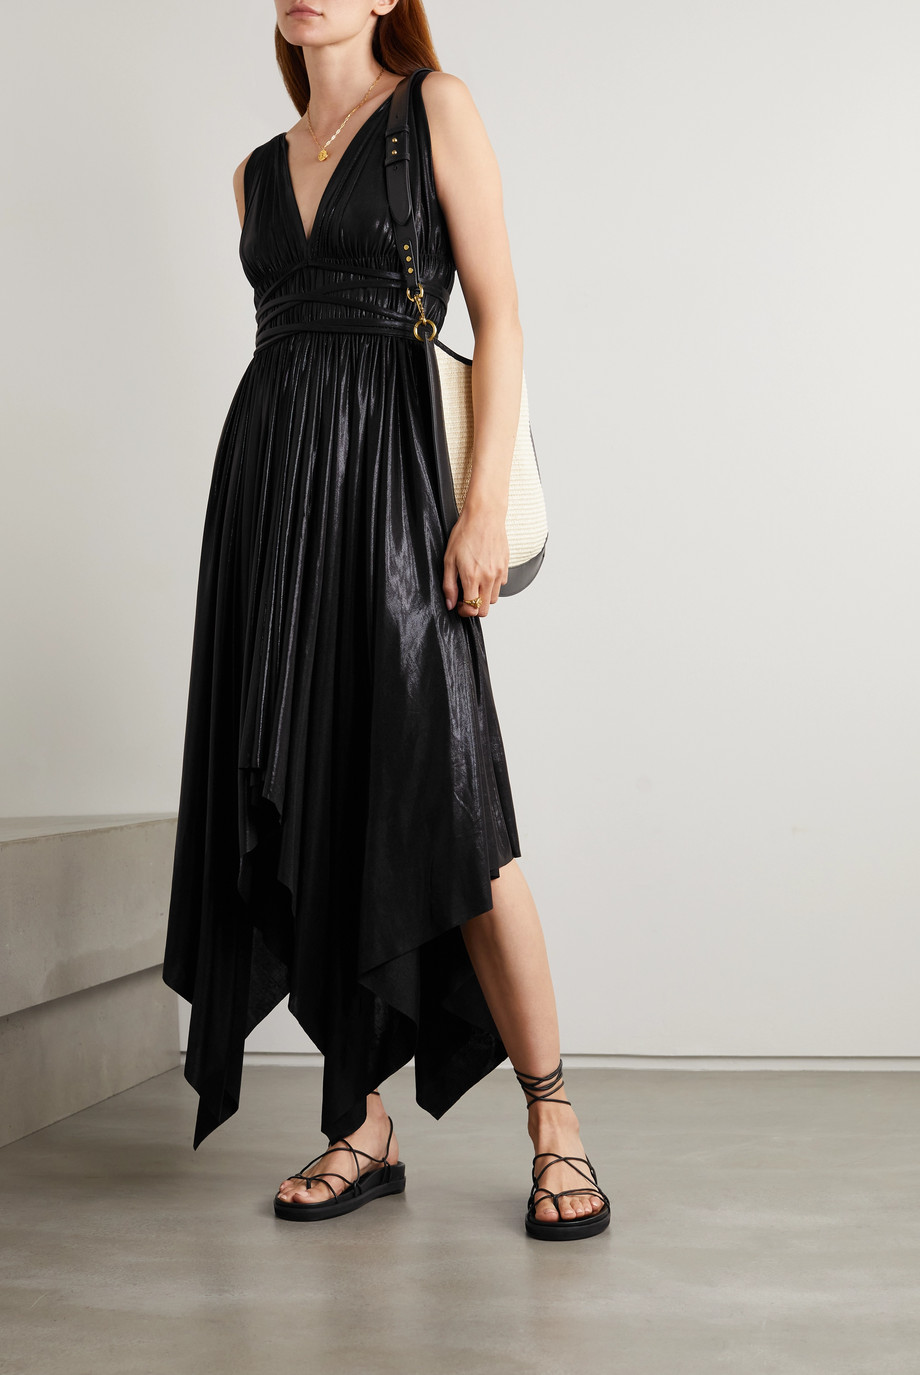 Norma Kamali Goddess asymmetric stretch-lamé dress